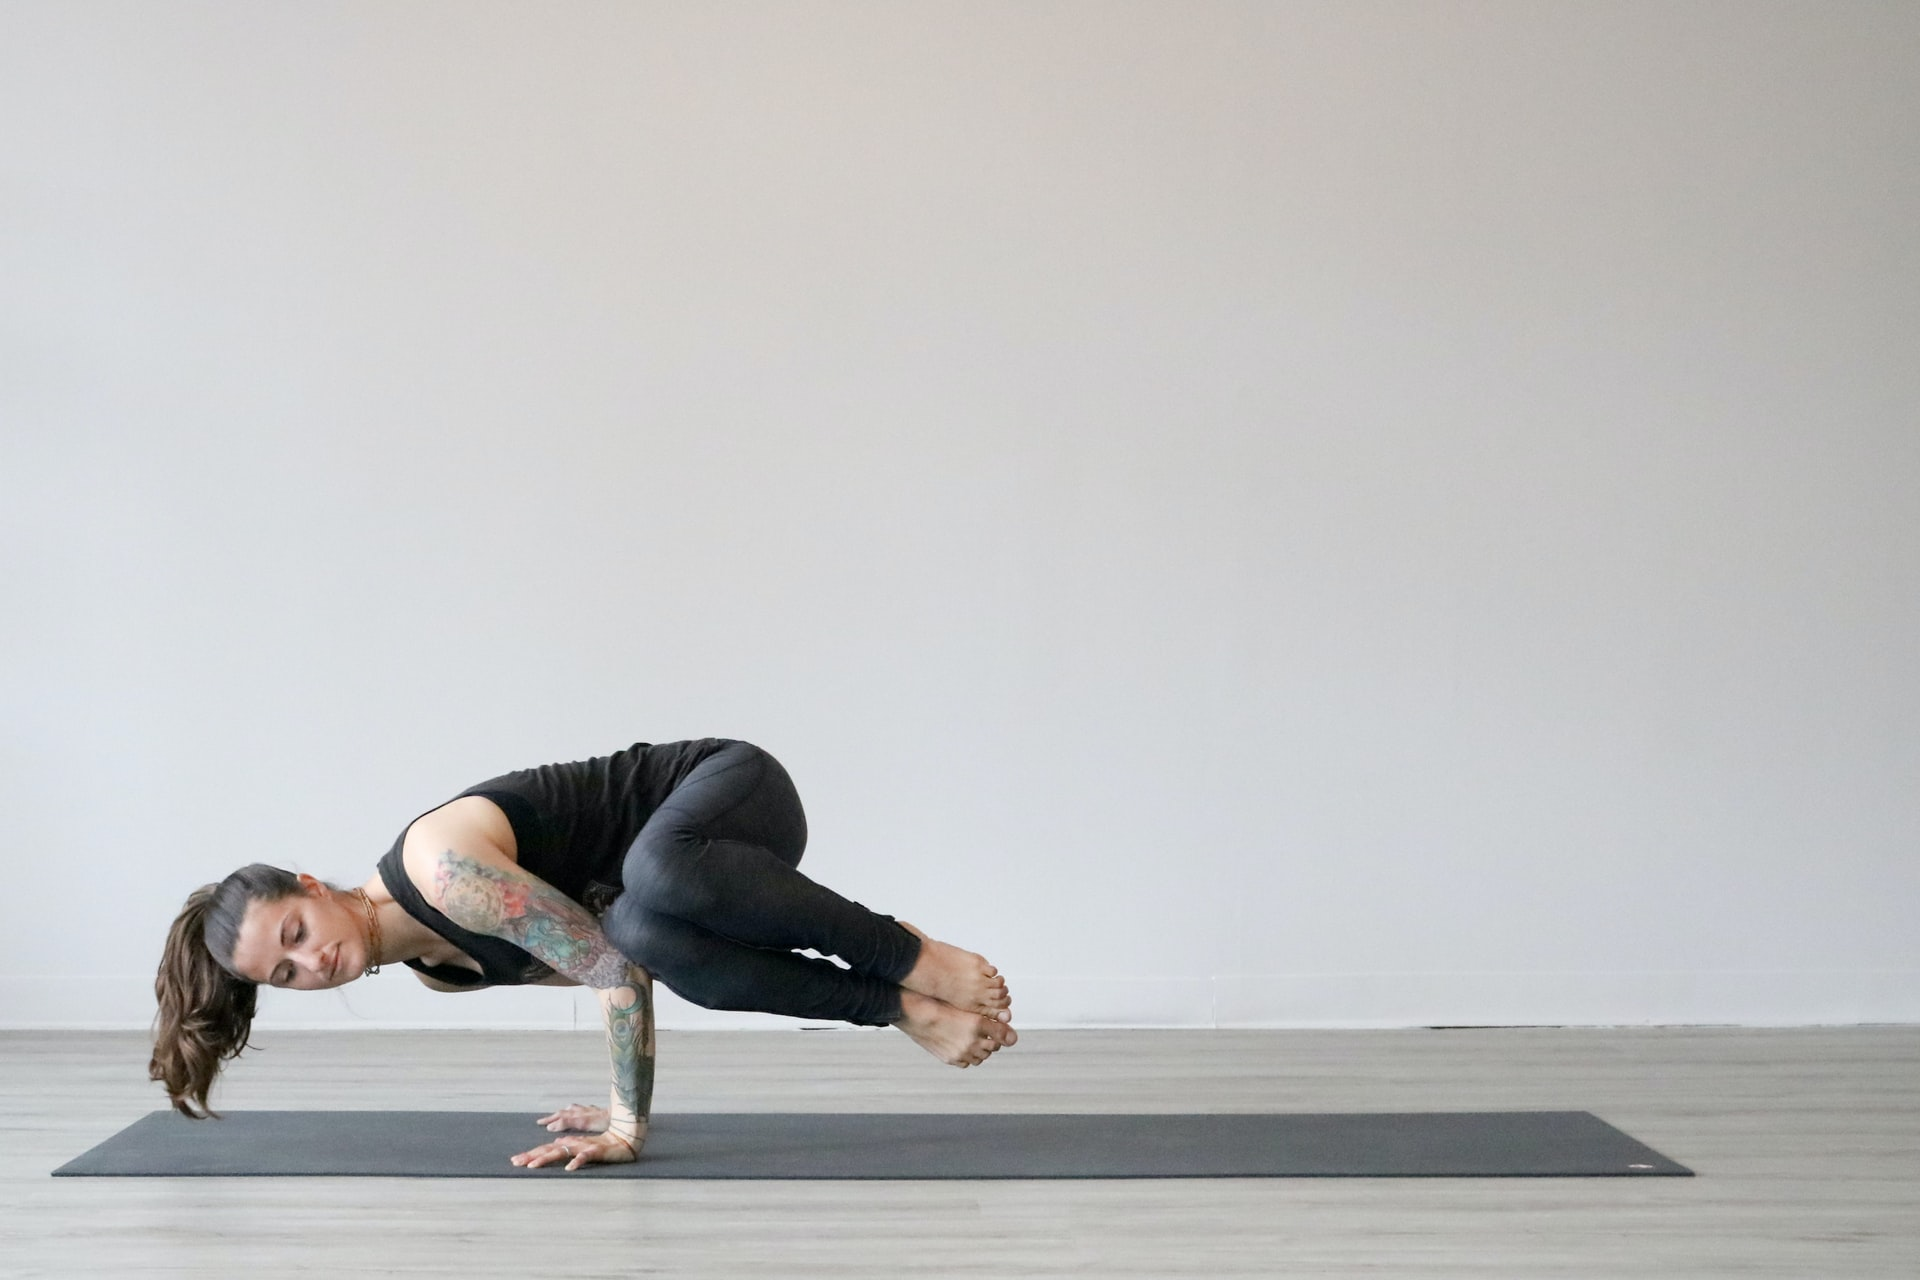 fitness self-evaluation